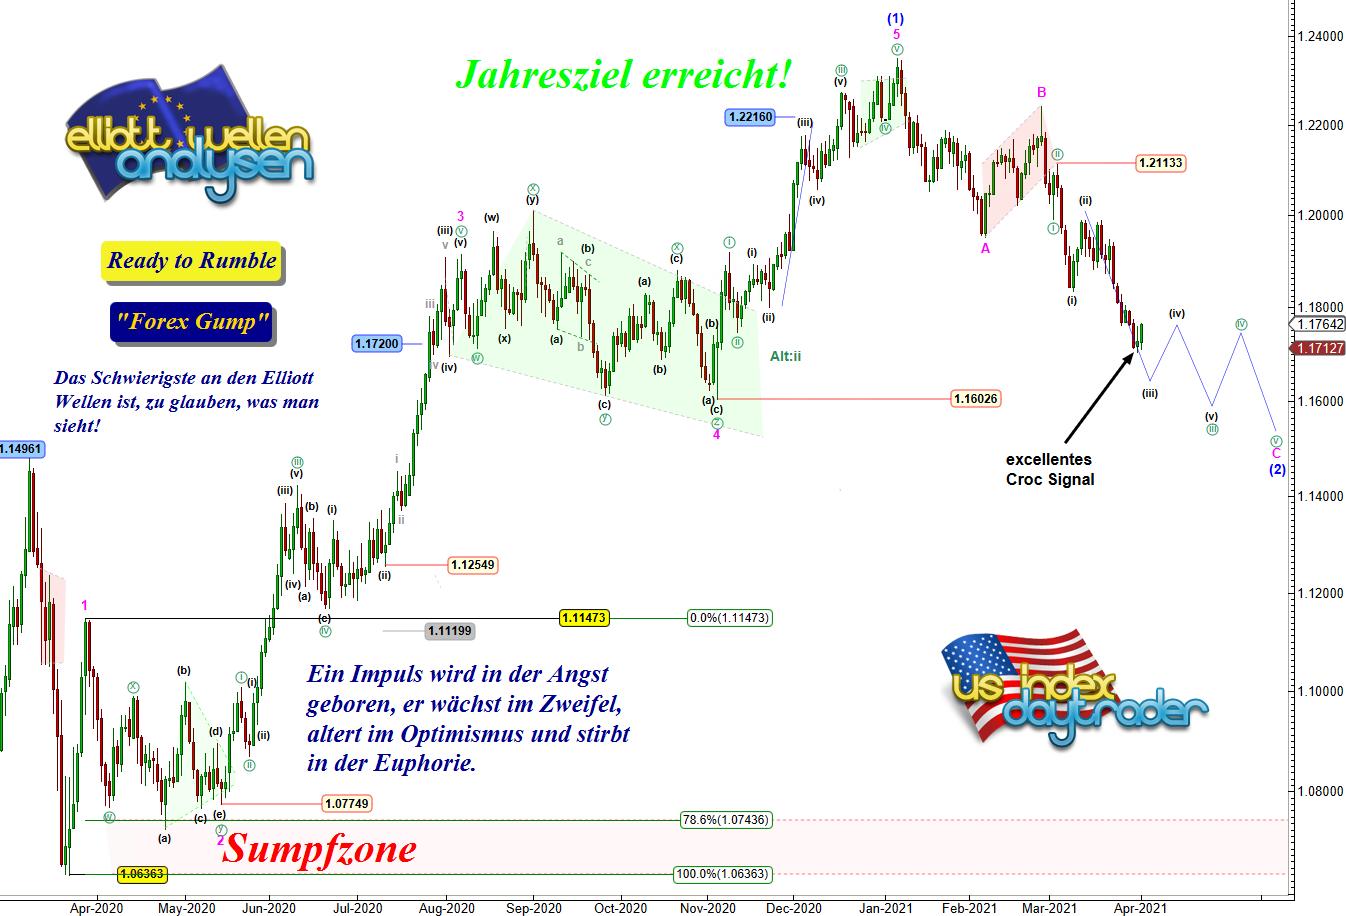 EW-Analyse-EUR-USD-Achtung-Shorter-Chartanalyse-André-Tiedje-GodmodeTrader.de-1